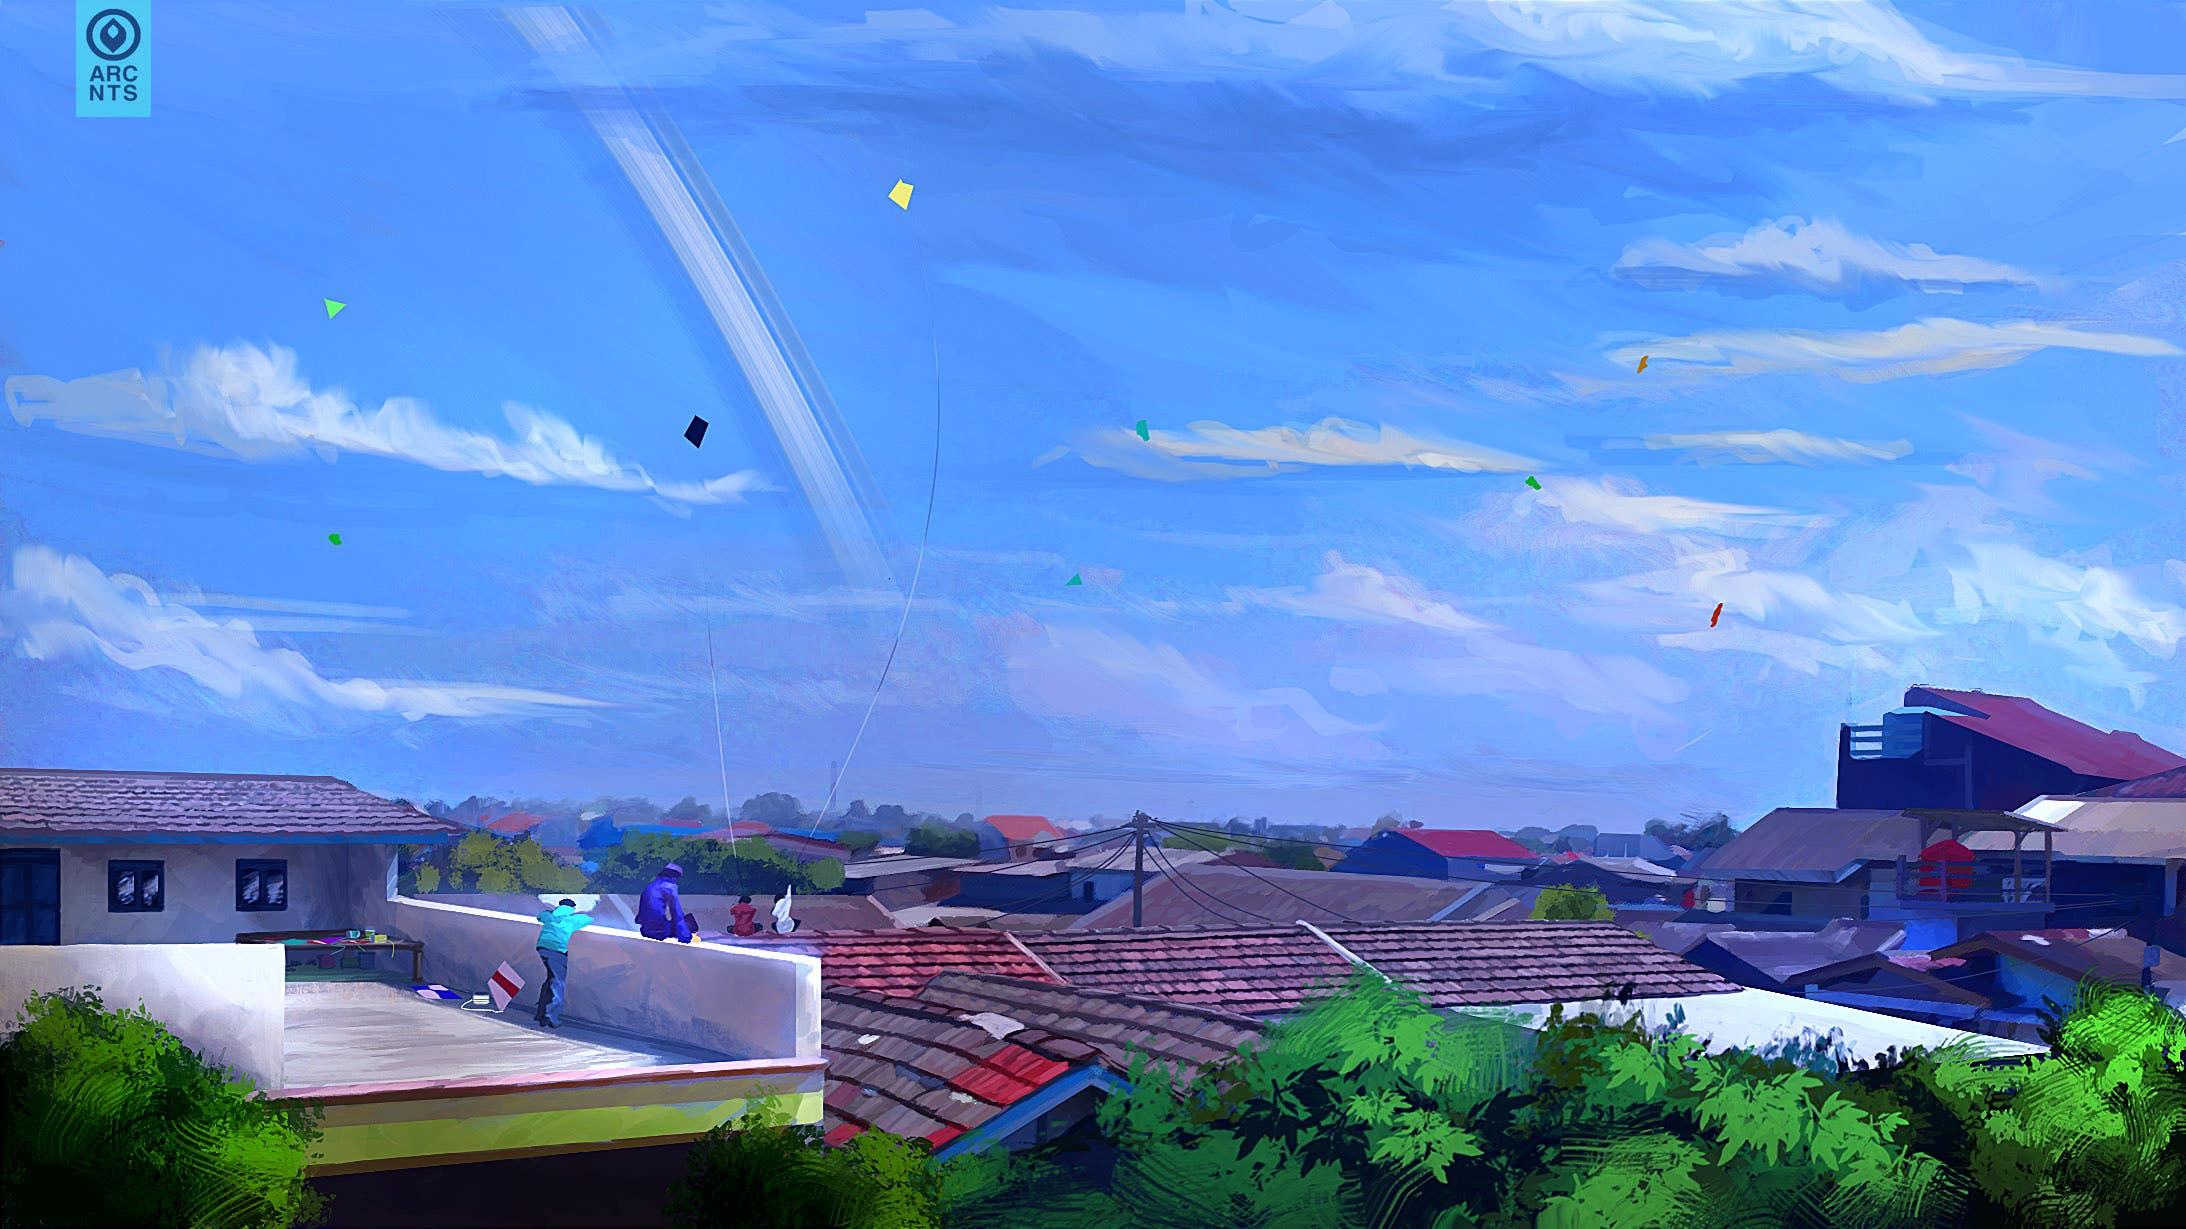 Roofground